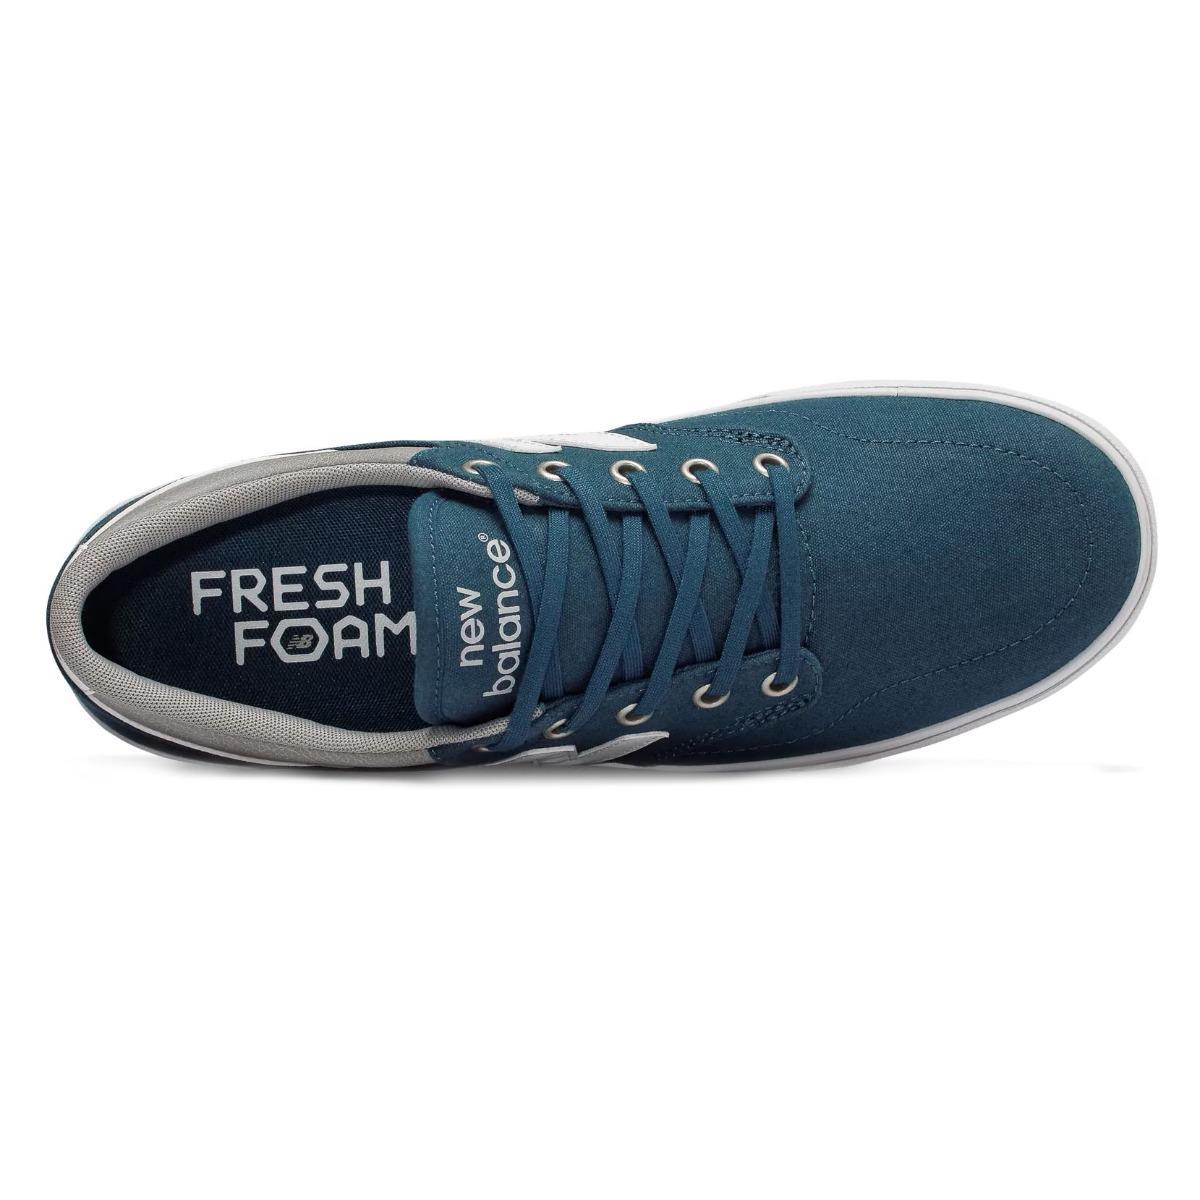 Dunkel Marineblau//Gewachst Neu mit Etikett Globe Neue Herren GS Schuhe